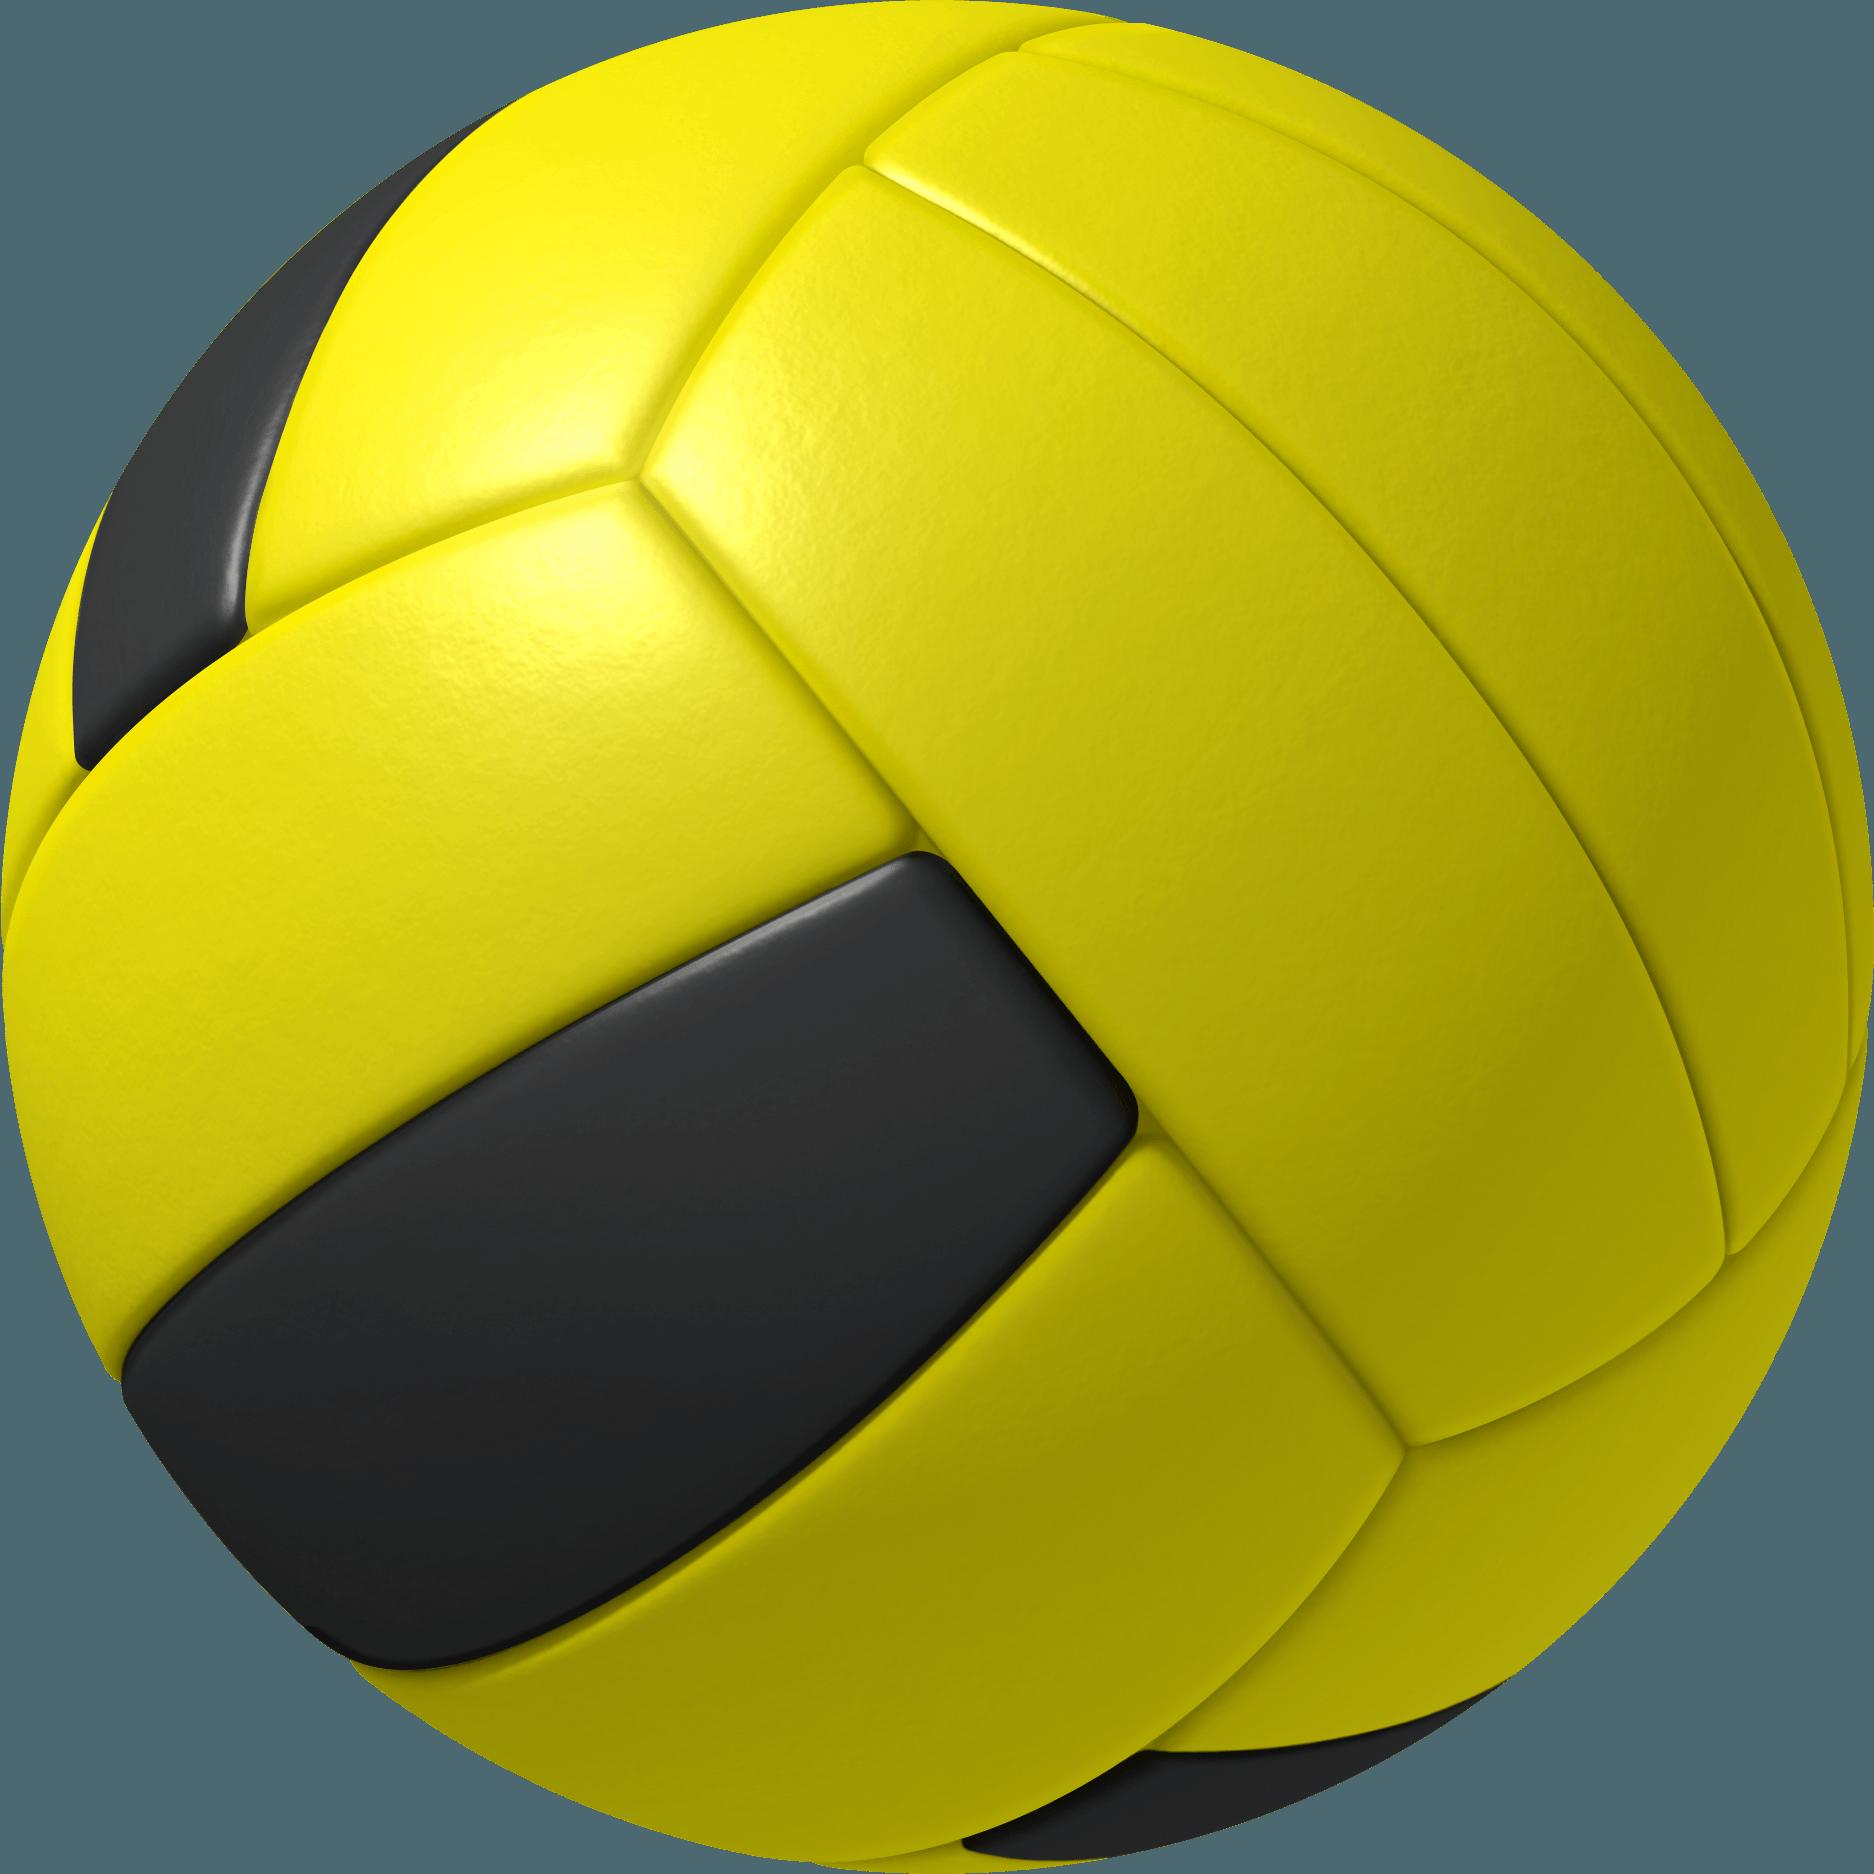 Mario Sports Mix (Wii) Artwork including Balls & Equipment ...